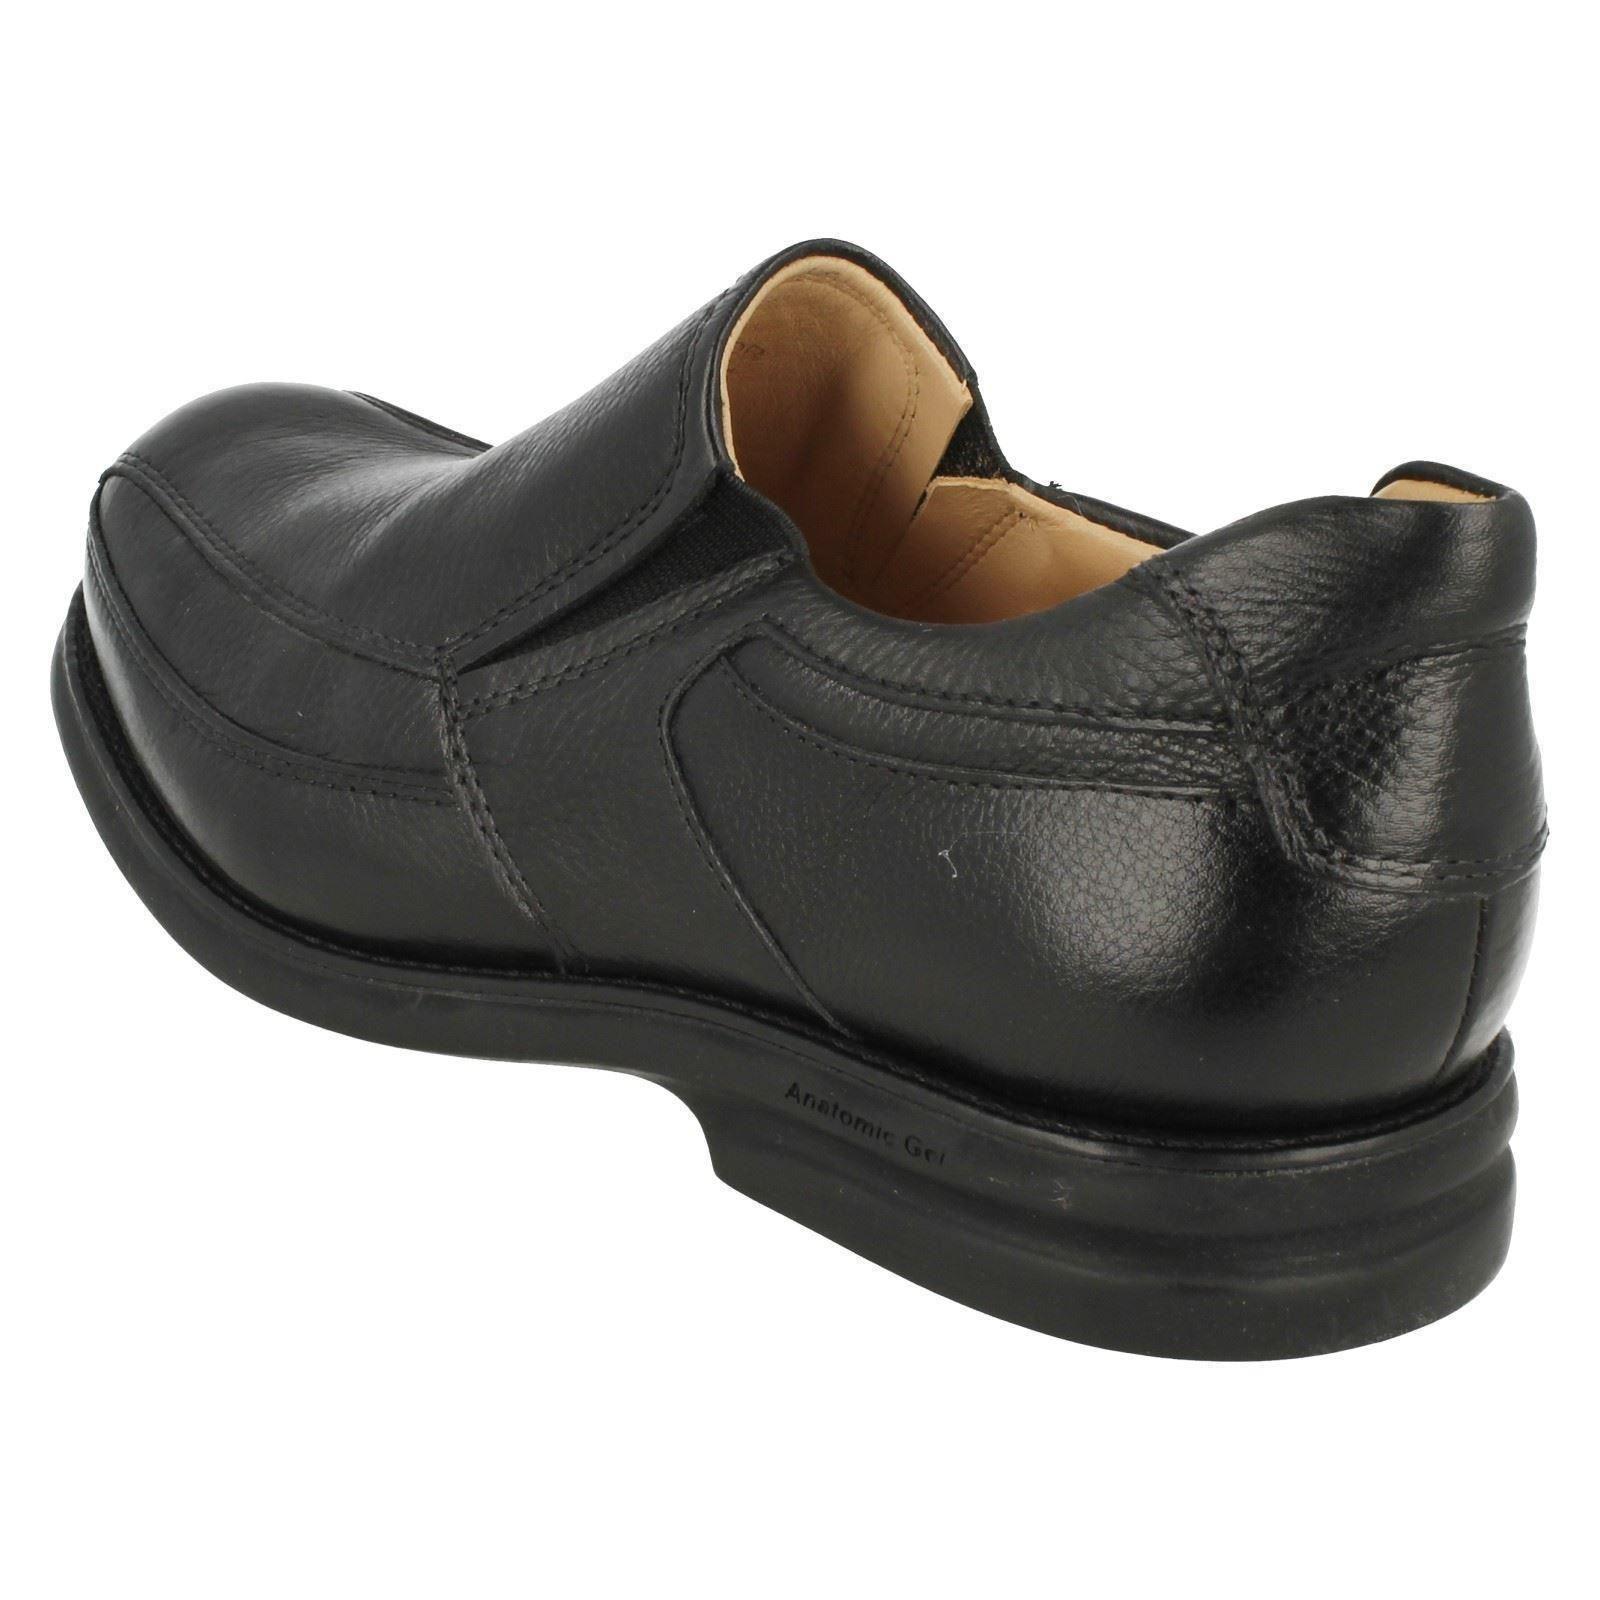 c33c822ad66c ... Nike Mens Mens Mens Versatile Ii Nbk Black Basketball Shoes Size 11.5  (424001) 227ed8 ...